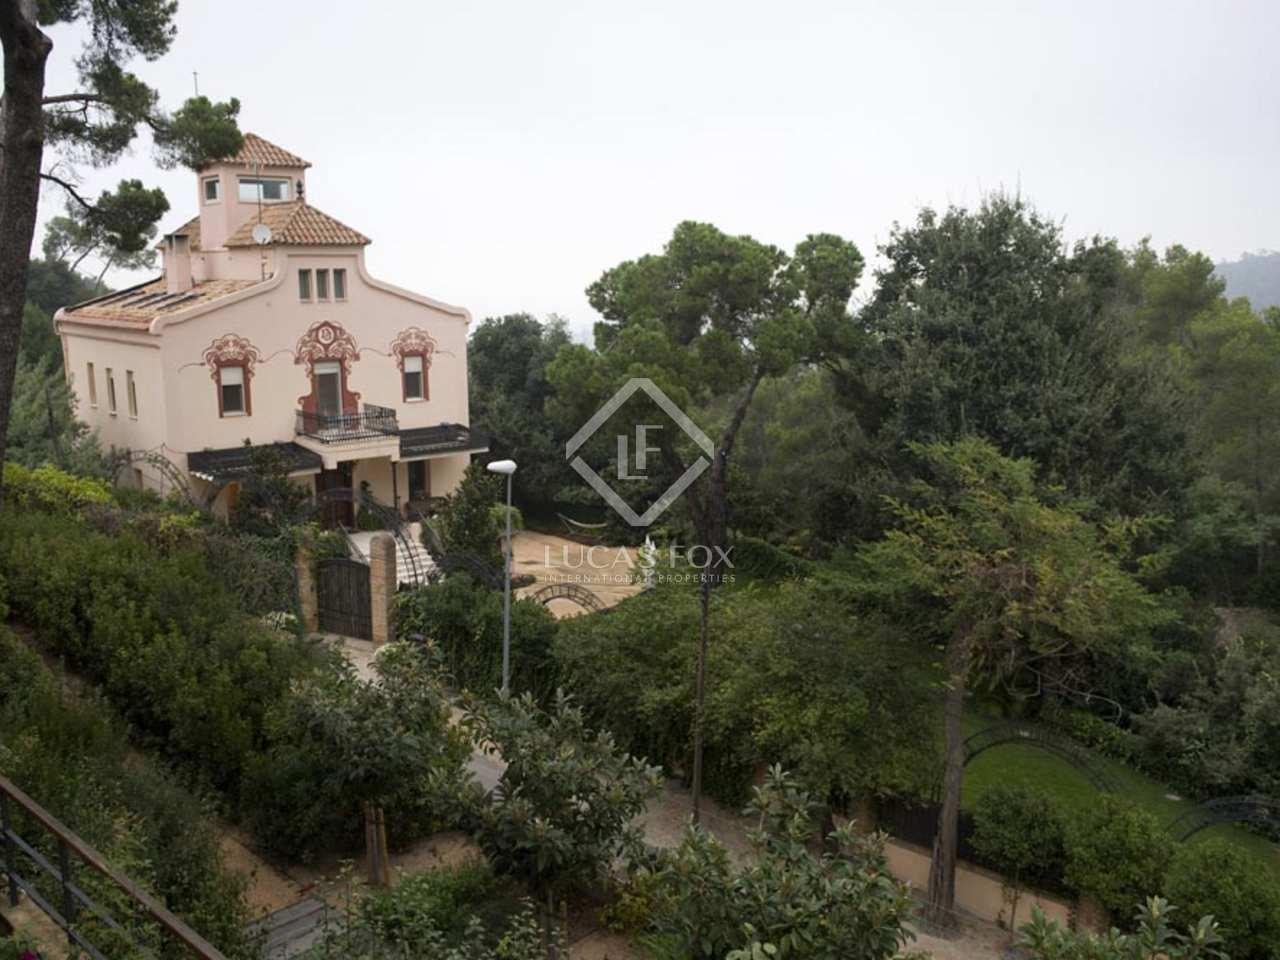 Casa de lujo en venta cerca de sant cugat barcelona - Natura casa barcelona ...